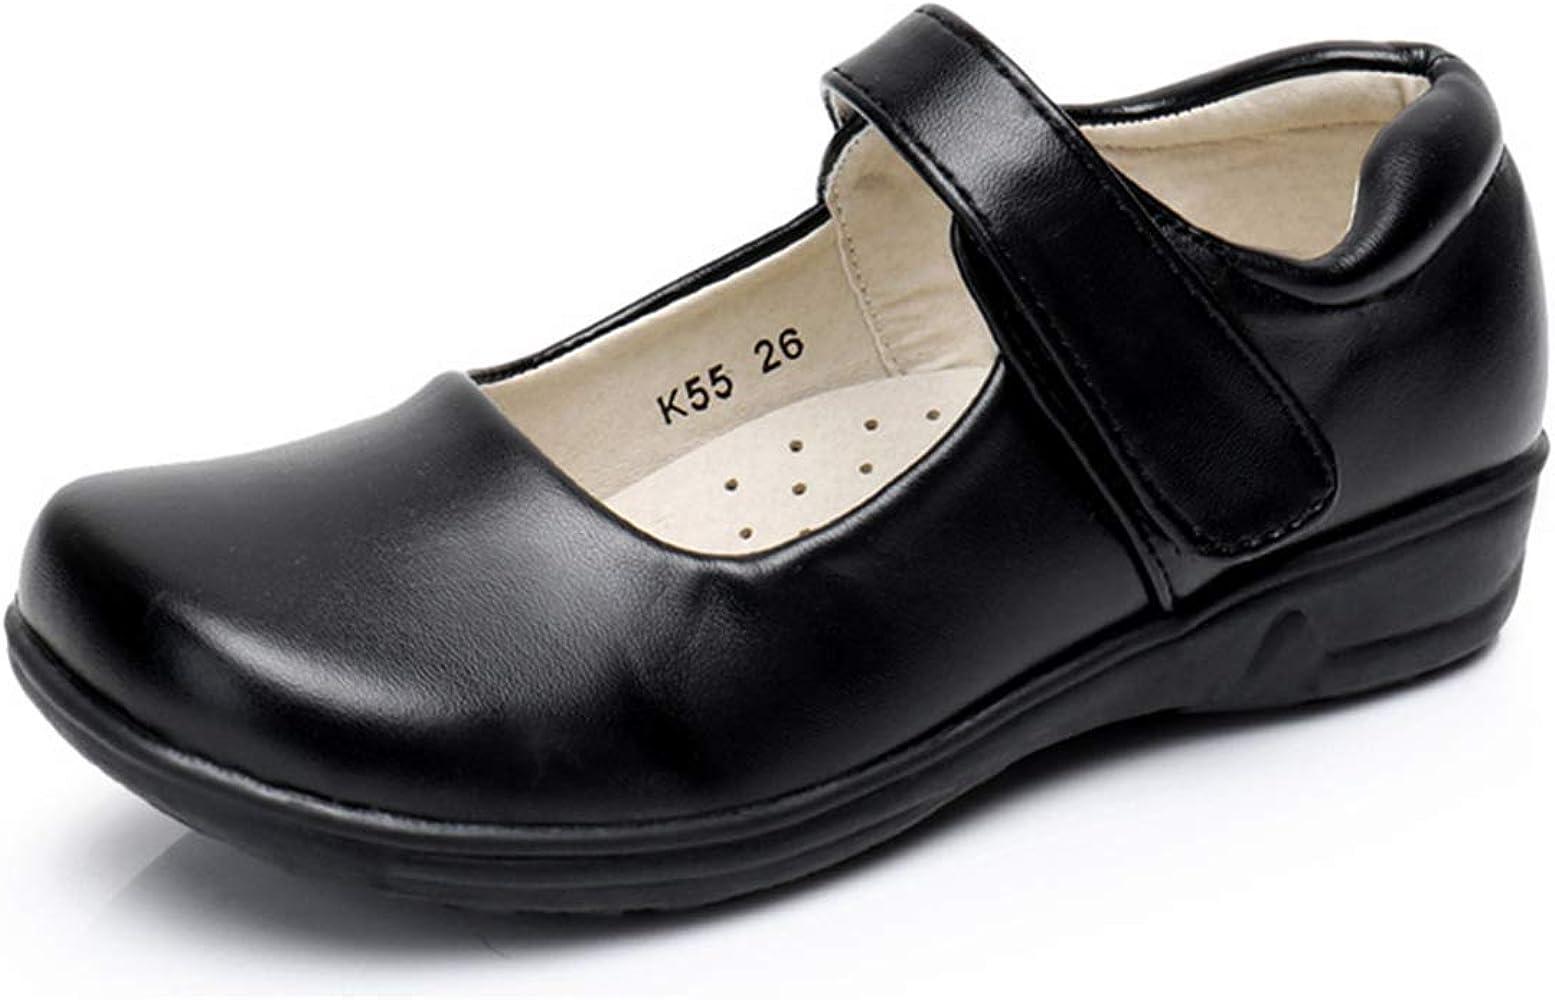 Amazon.com: Girls Dress Shoes Black